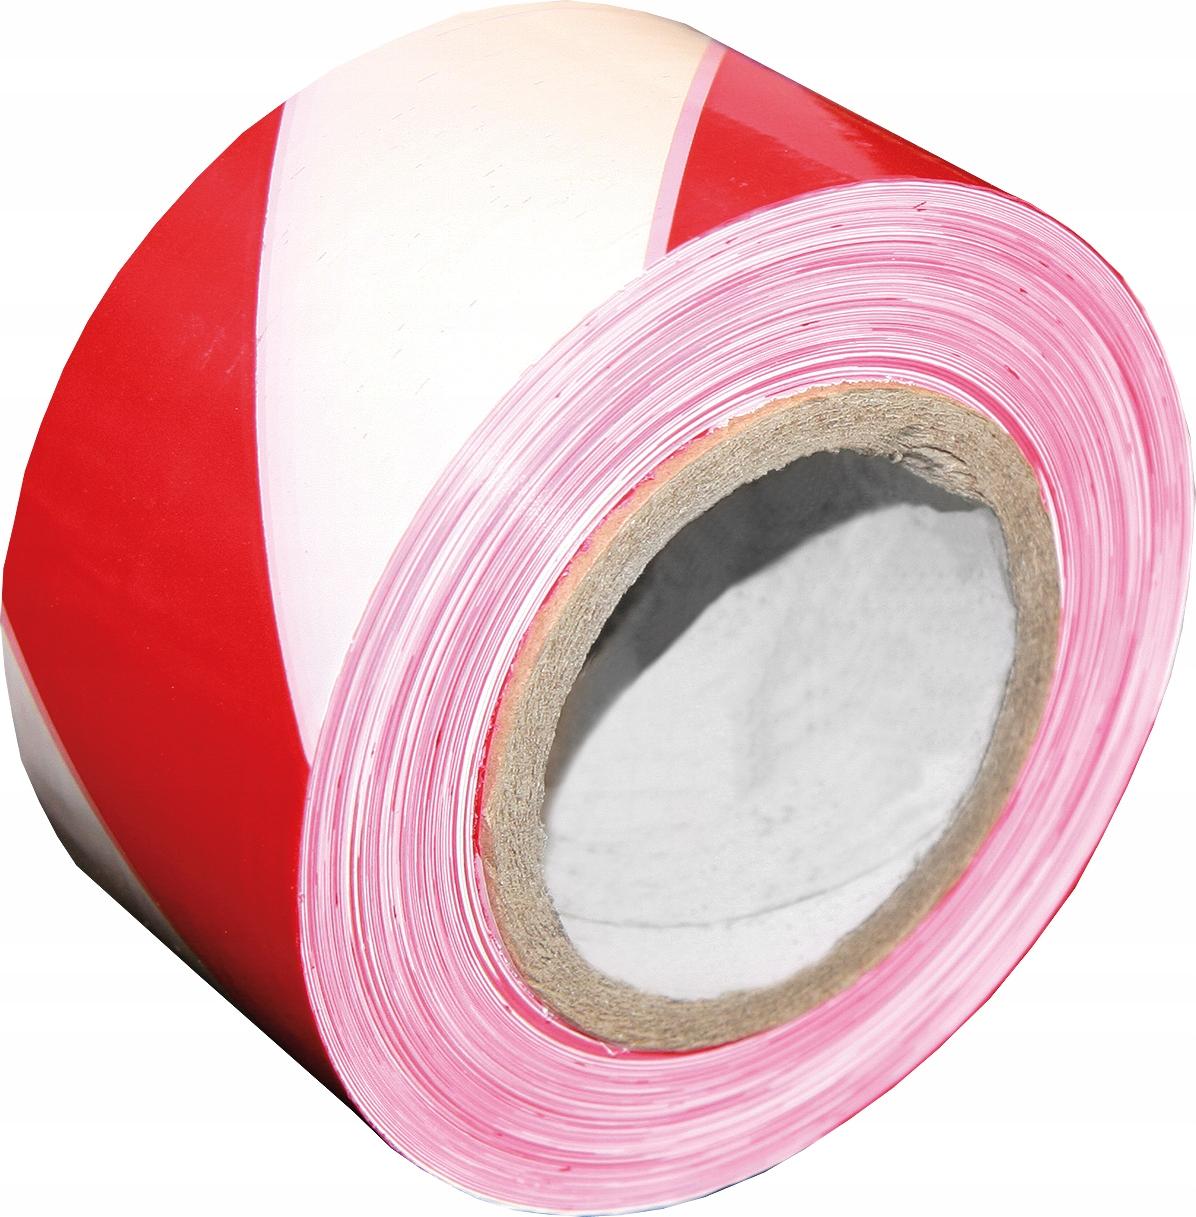 предупреждающая лента WHITE-RED 100 м